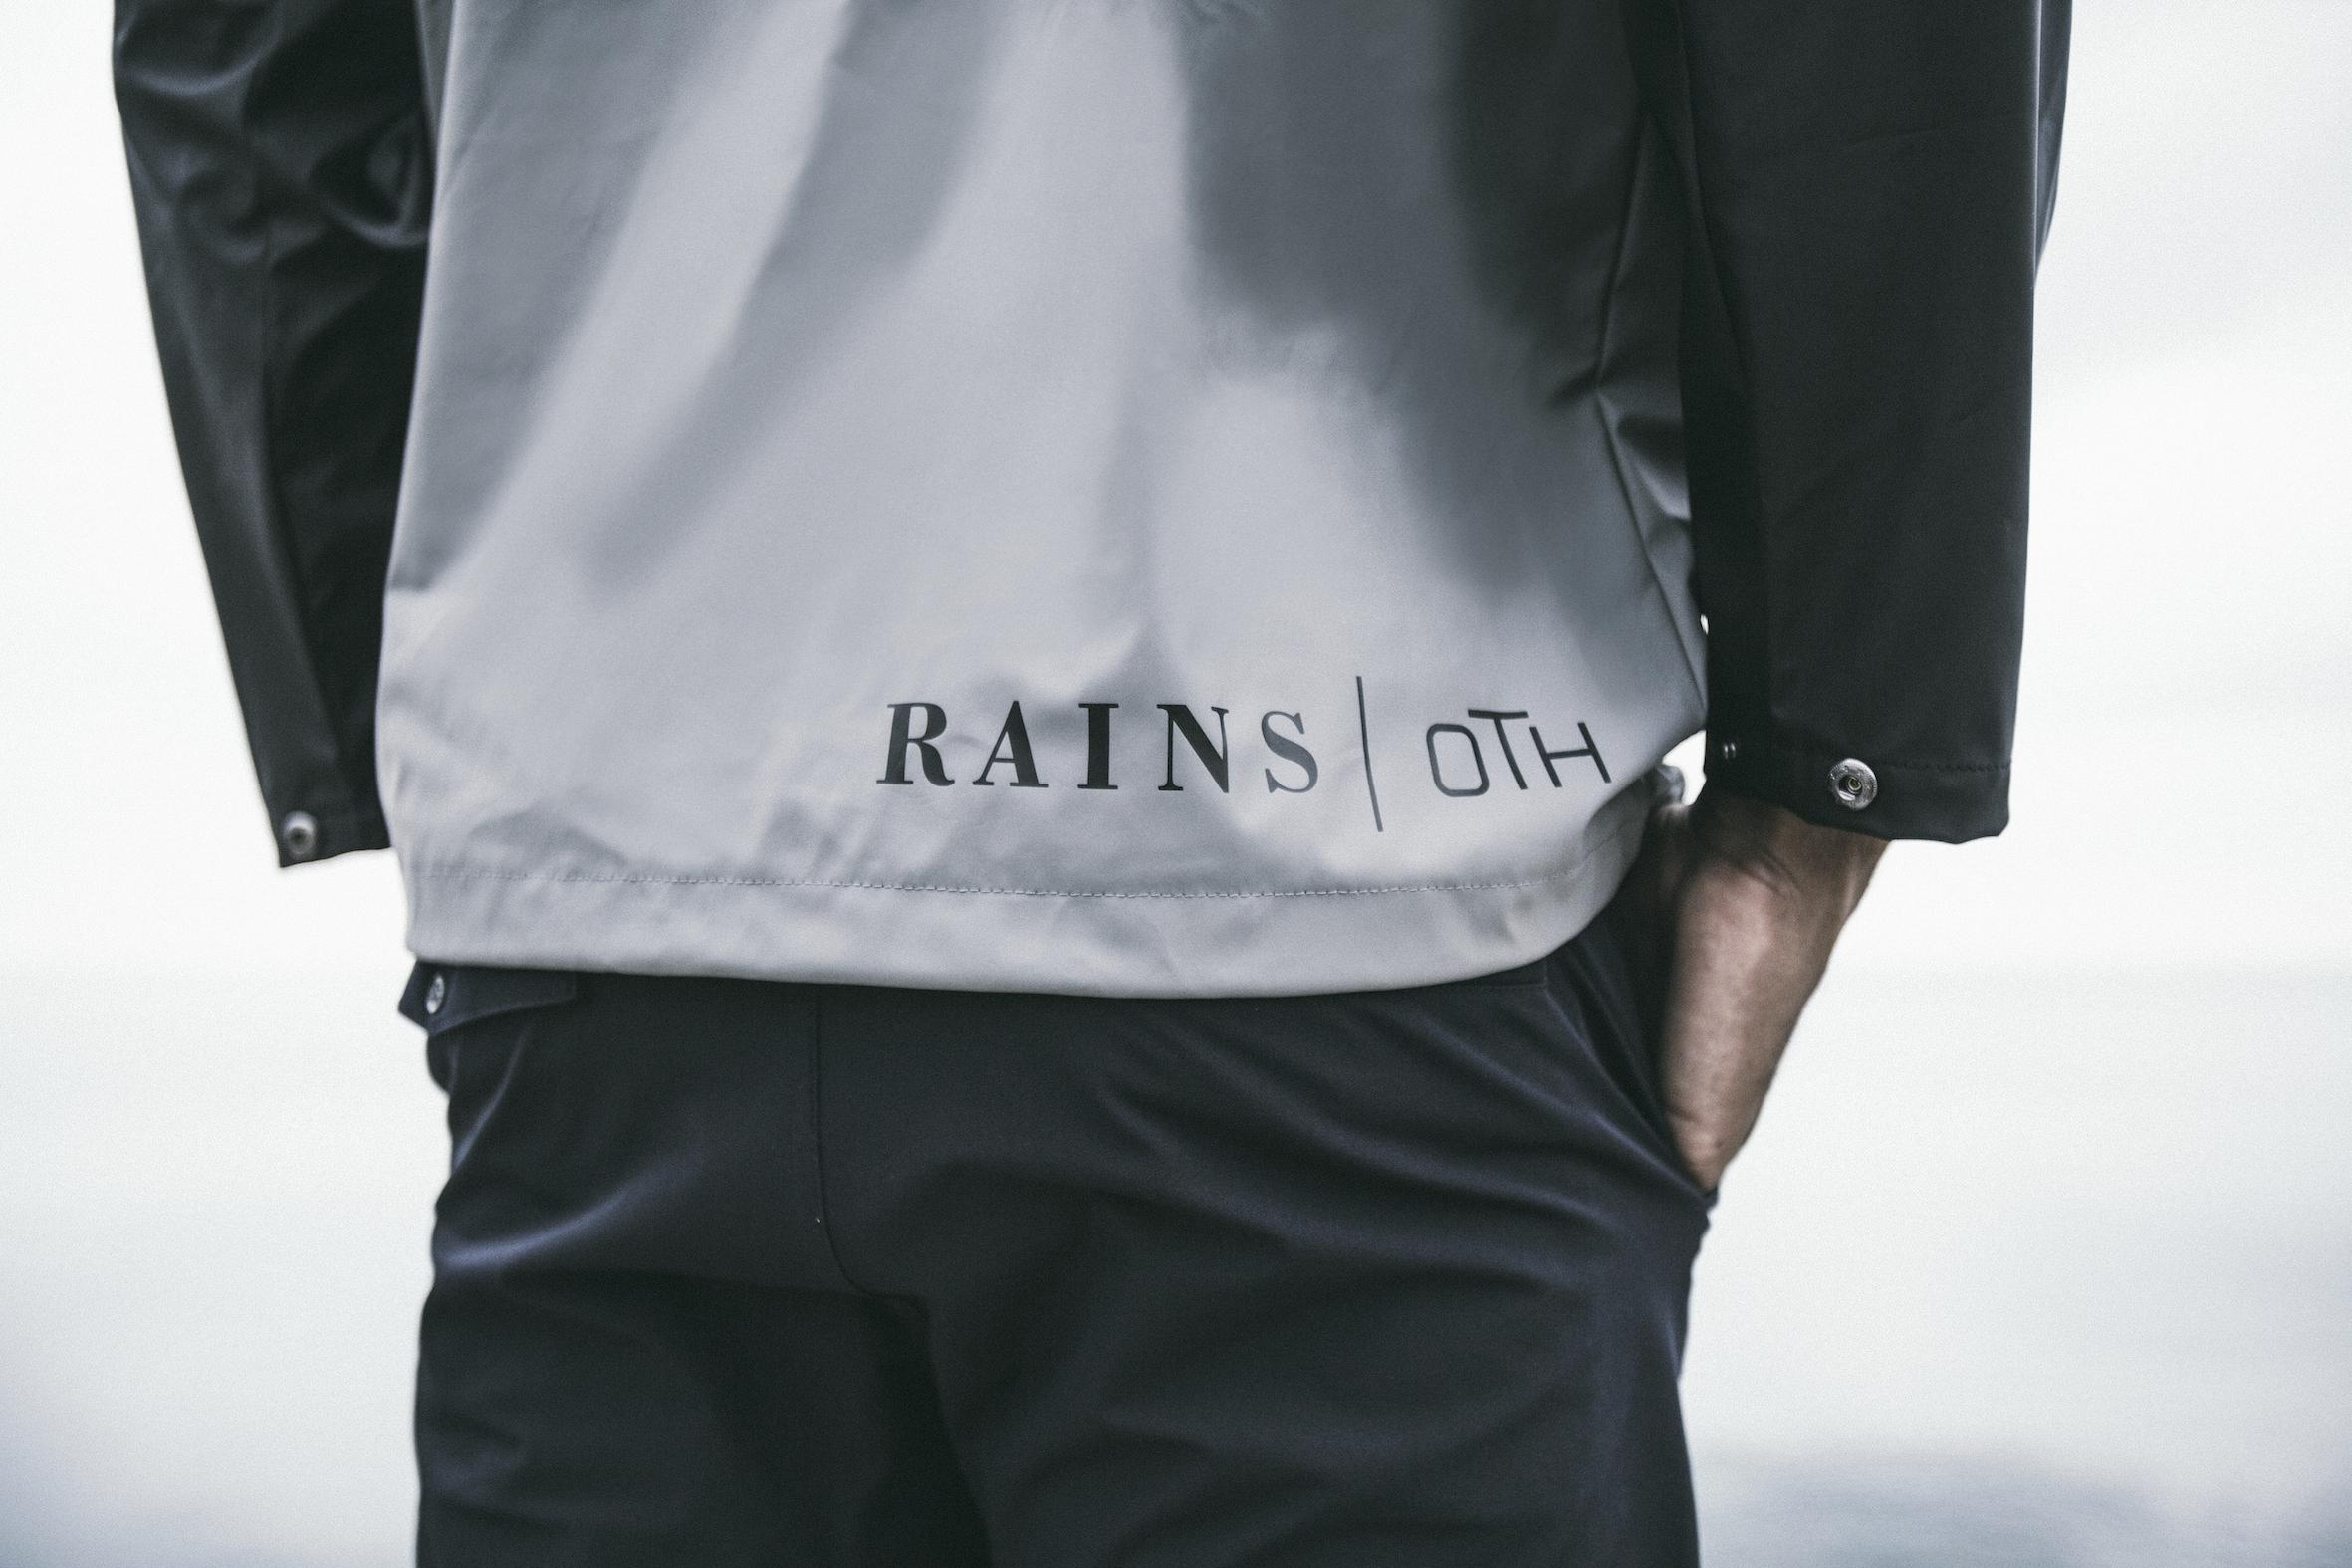 RAINS x OTH